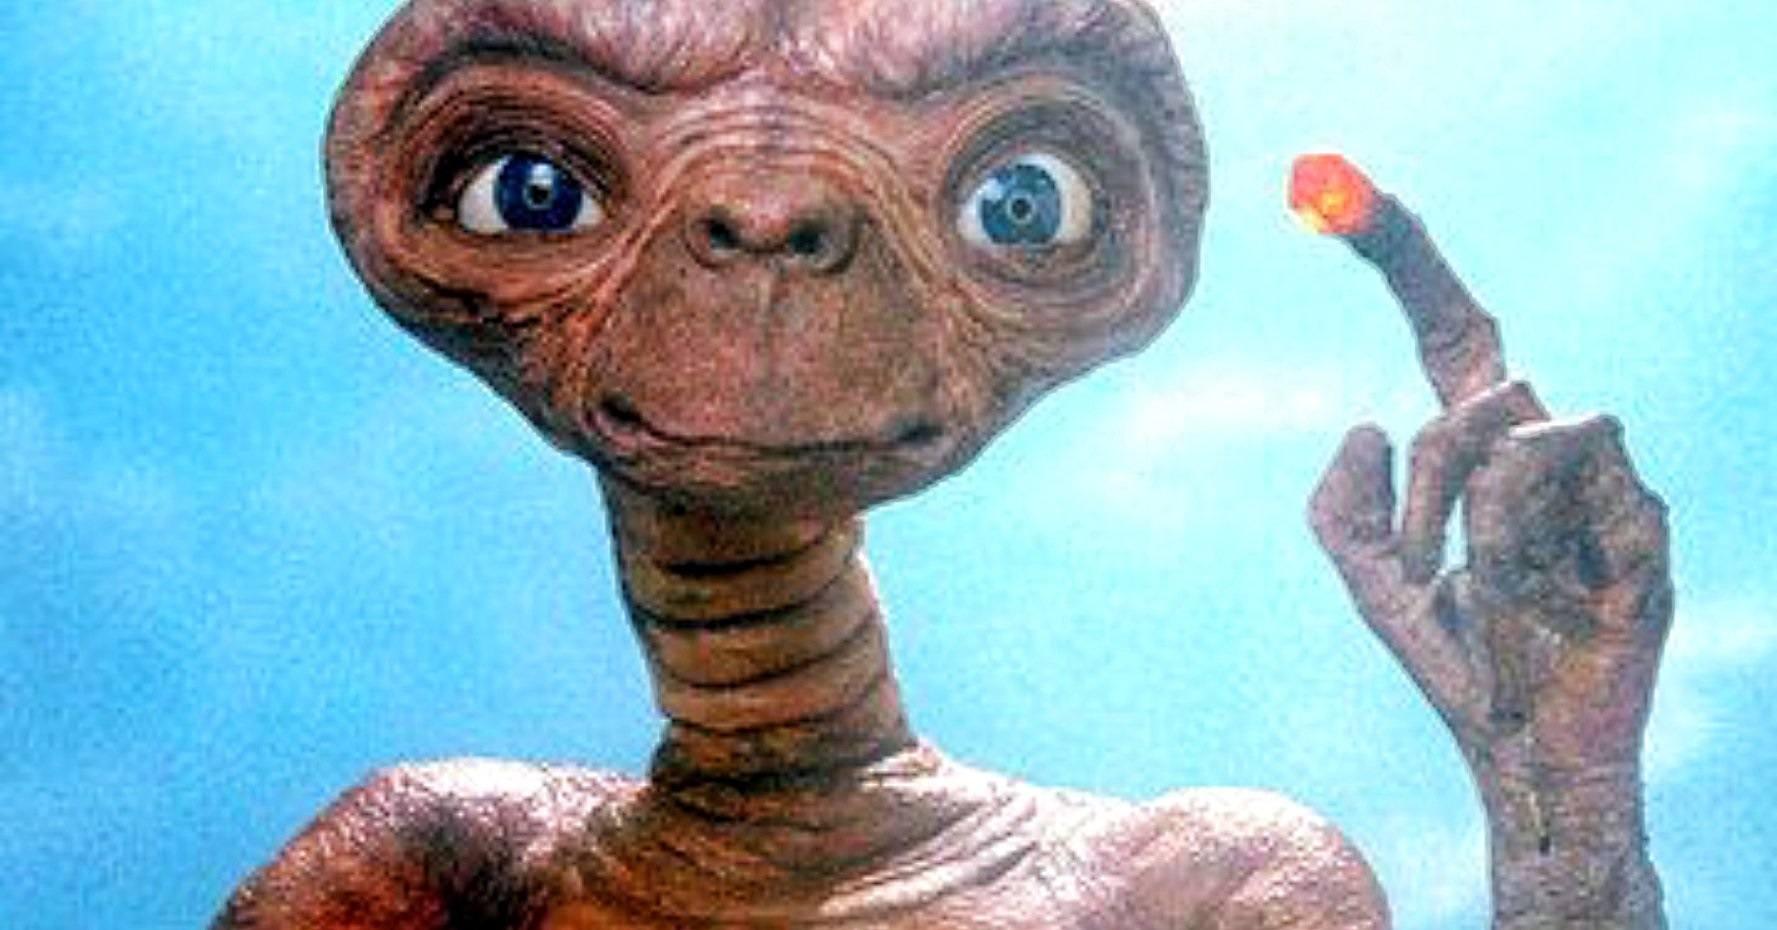 E.T. The Extra Terrestrial Spielberg movie